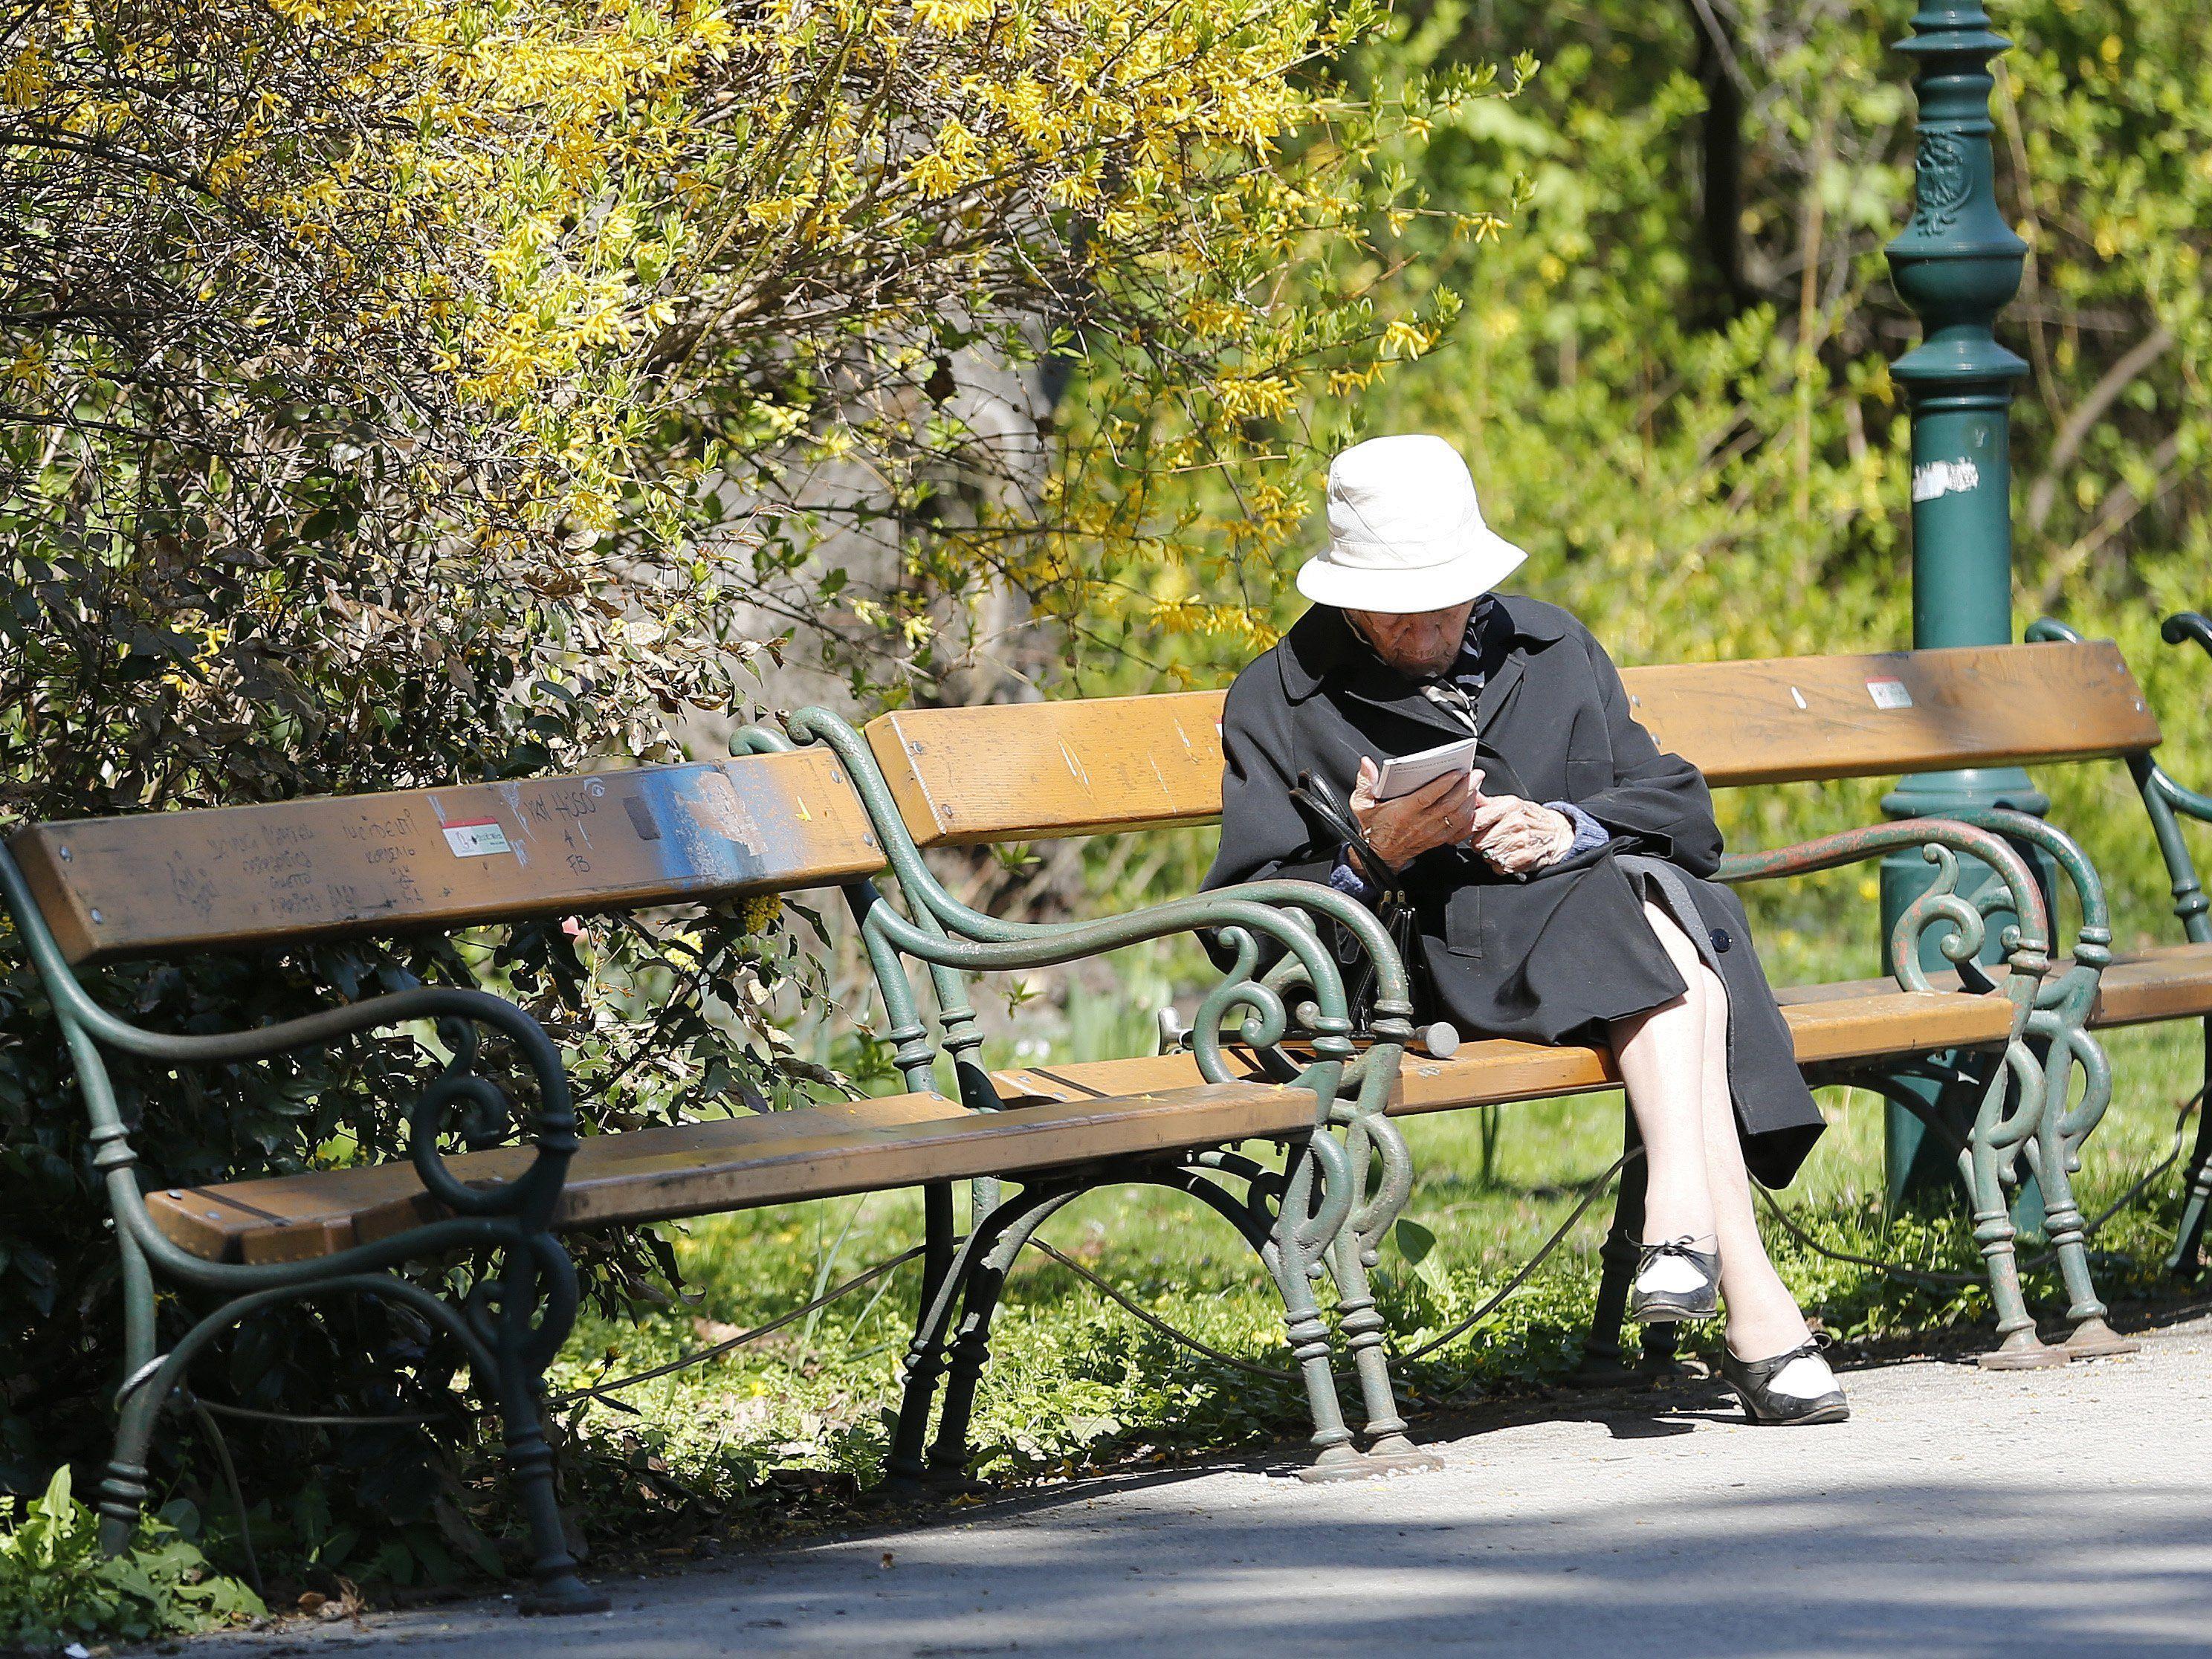 Kann man so das Pensionsproblem lösen?